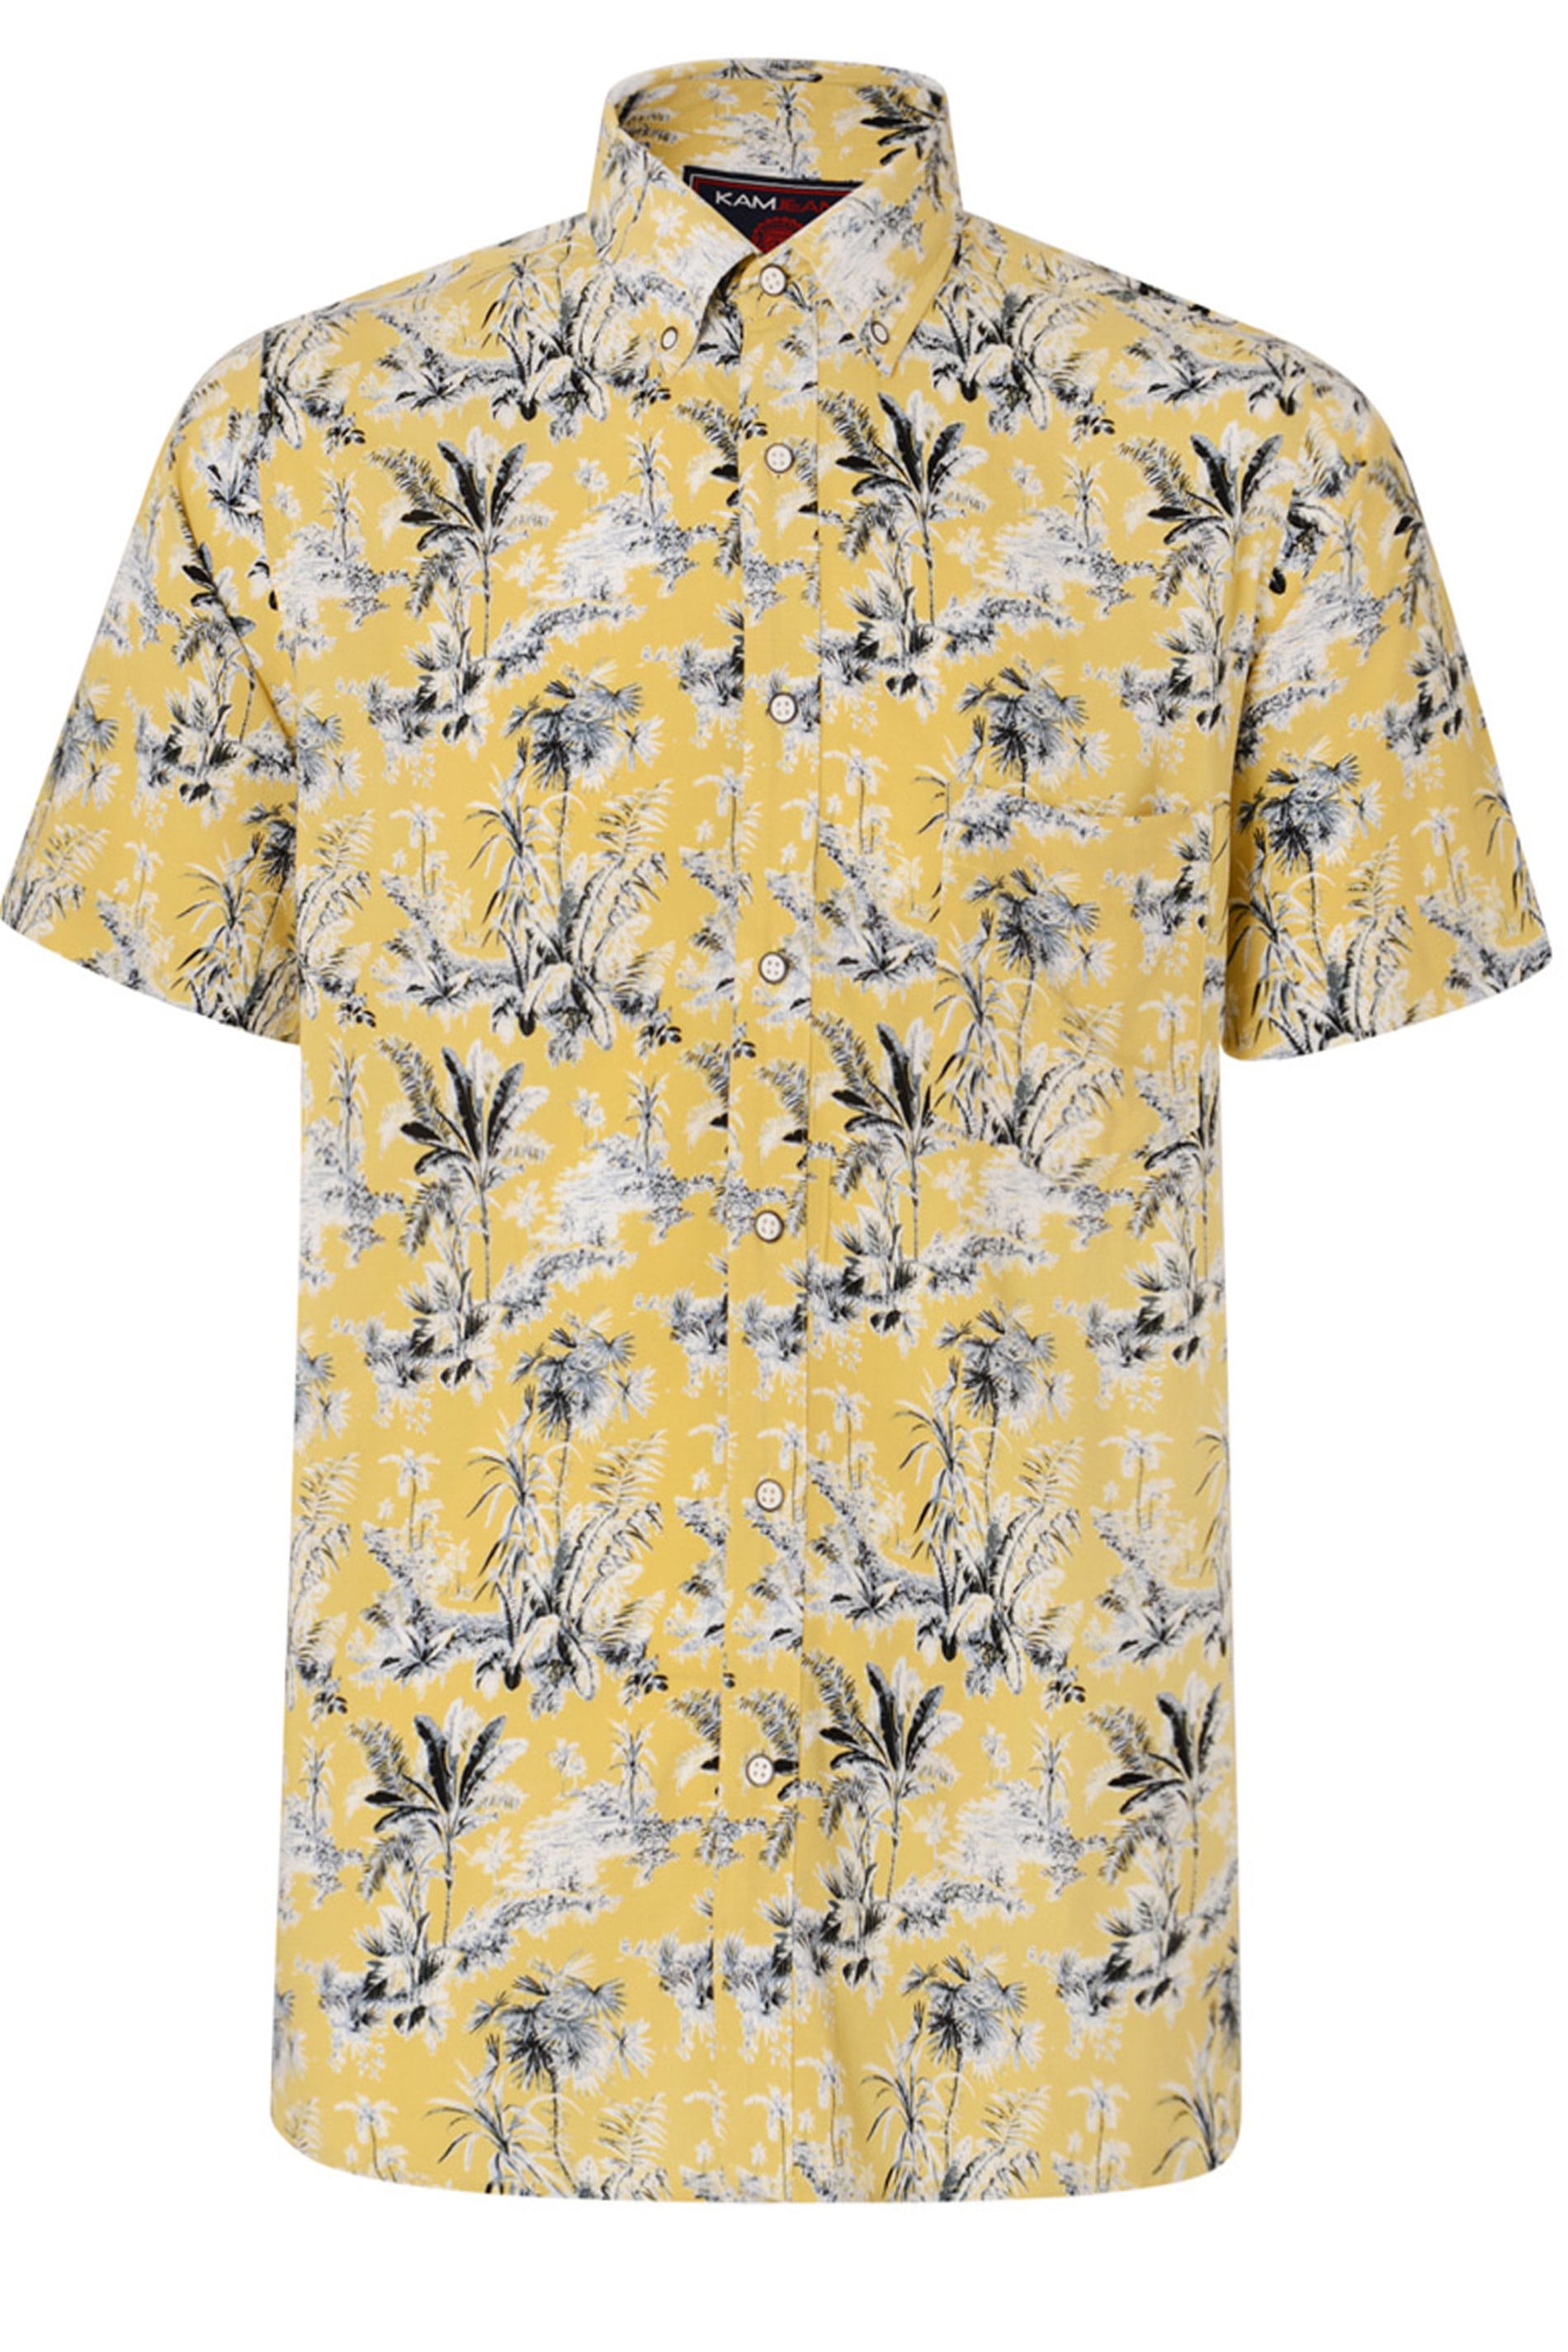 KAM Yellow Tropical Palm Print Shirt